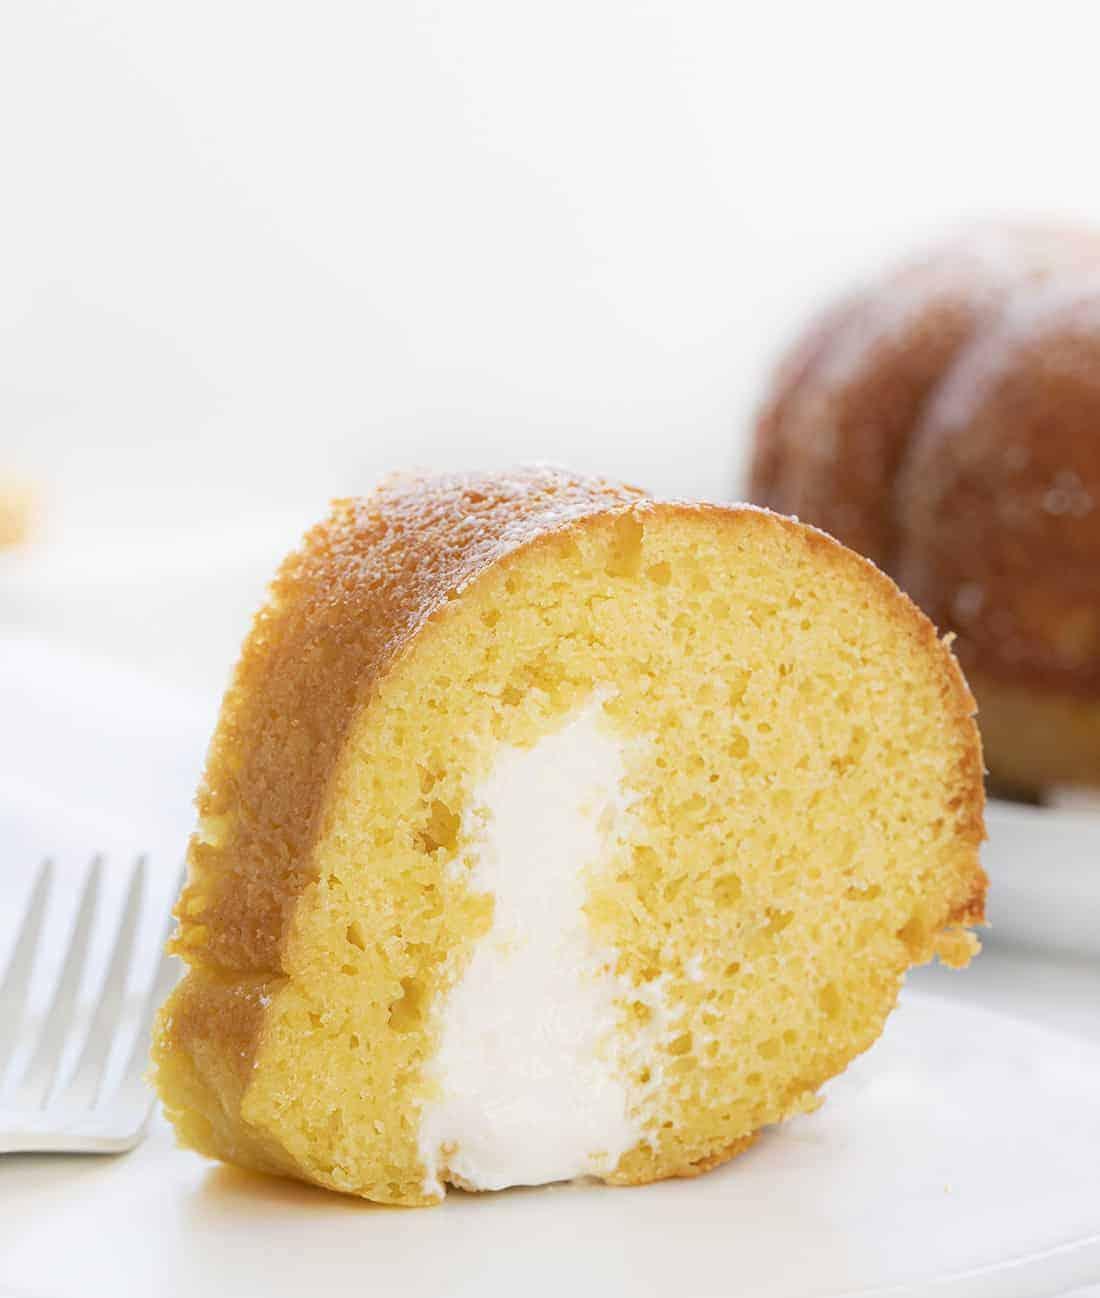 Slice of Cream Filled Yellow Cake {Twinkies Copycat}